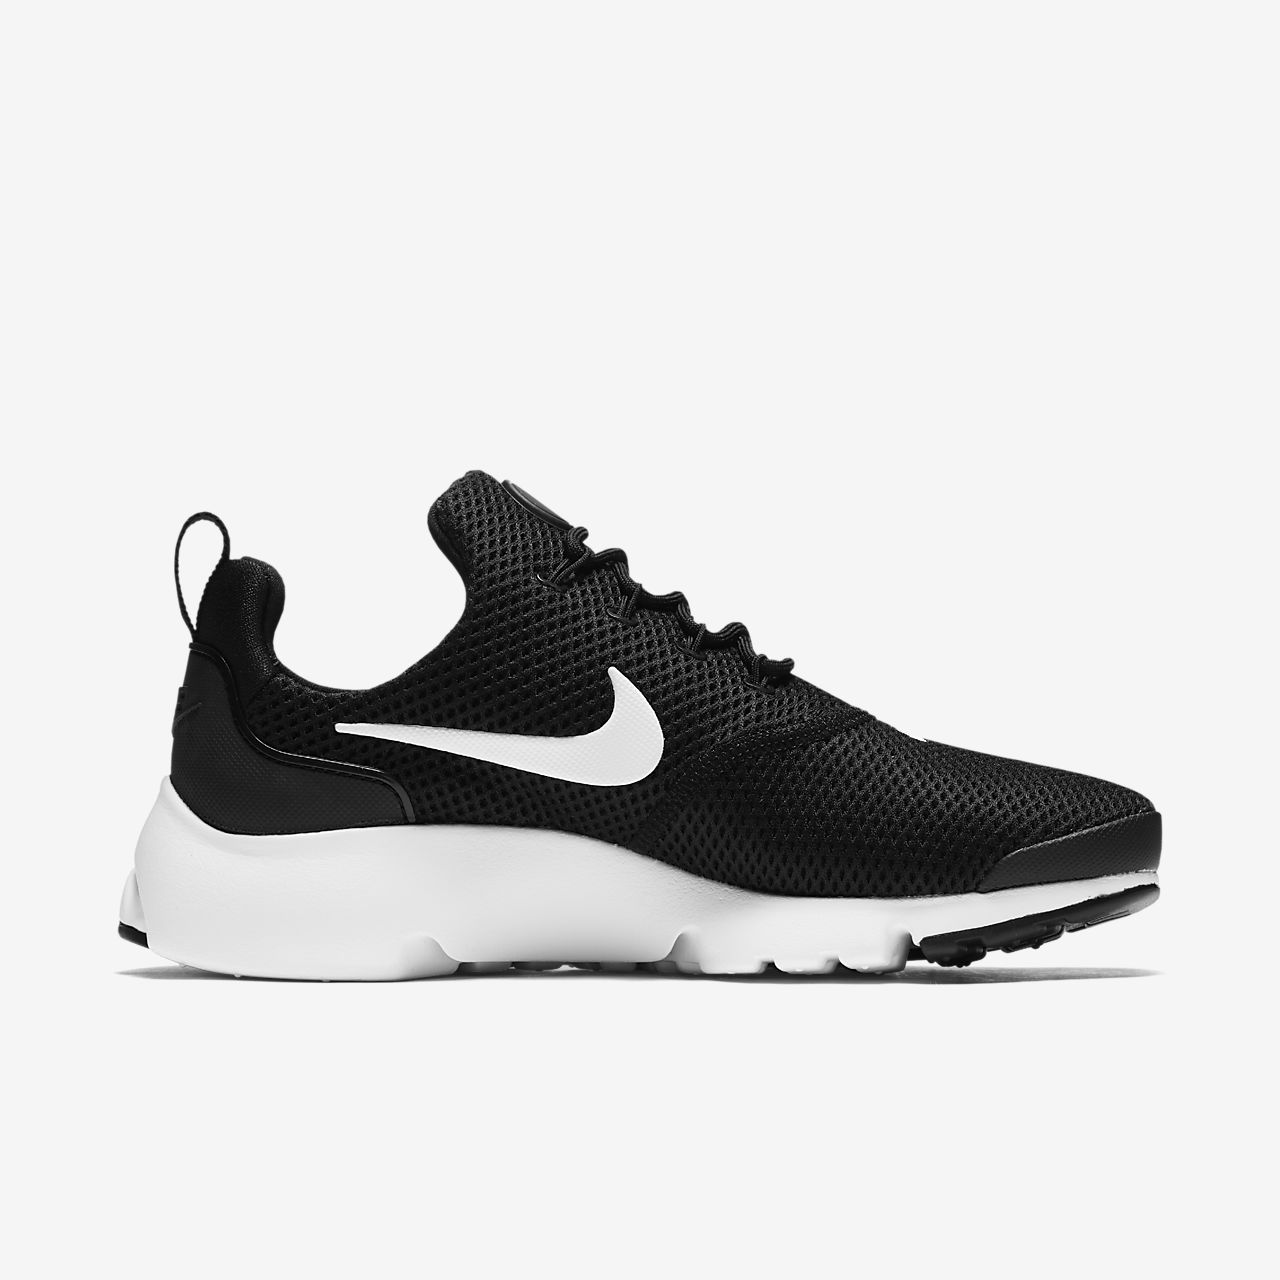 info for 0d2da c7190 ... Nike Presto Fly Womens Shoe